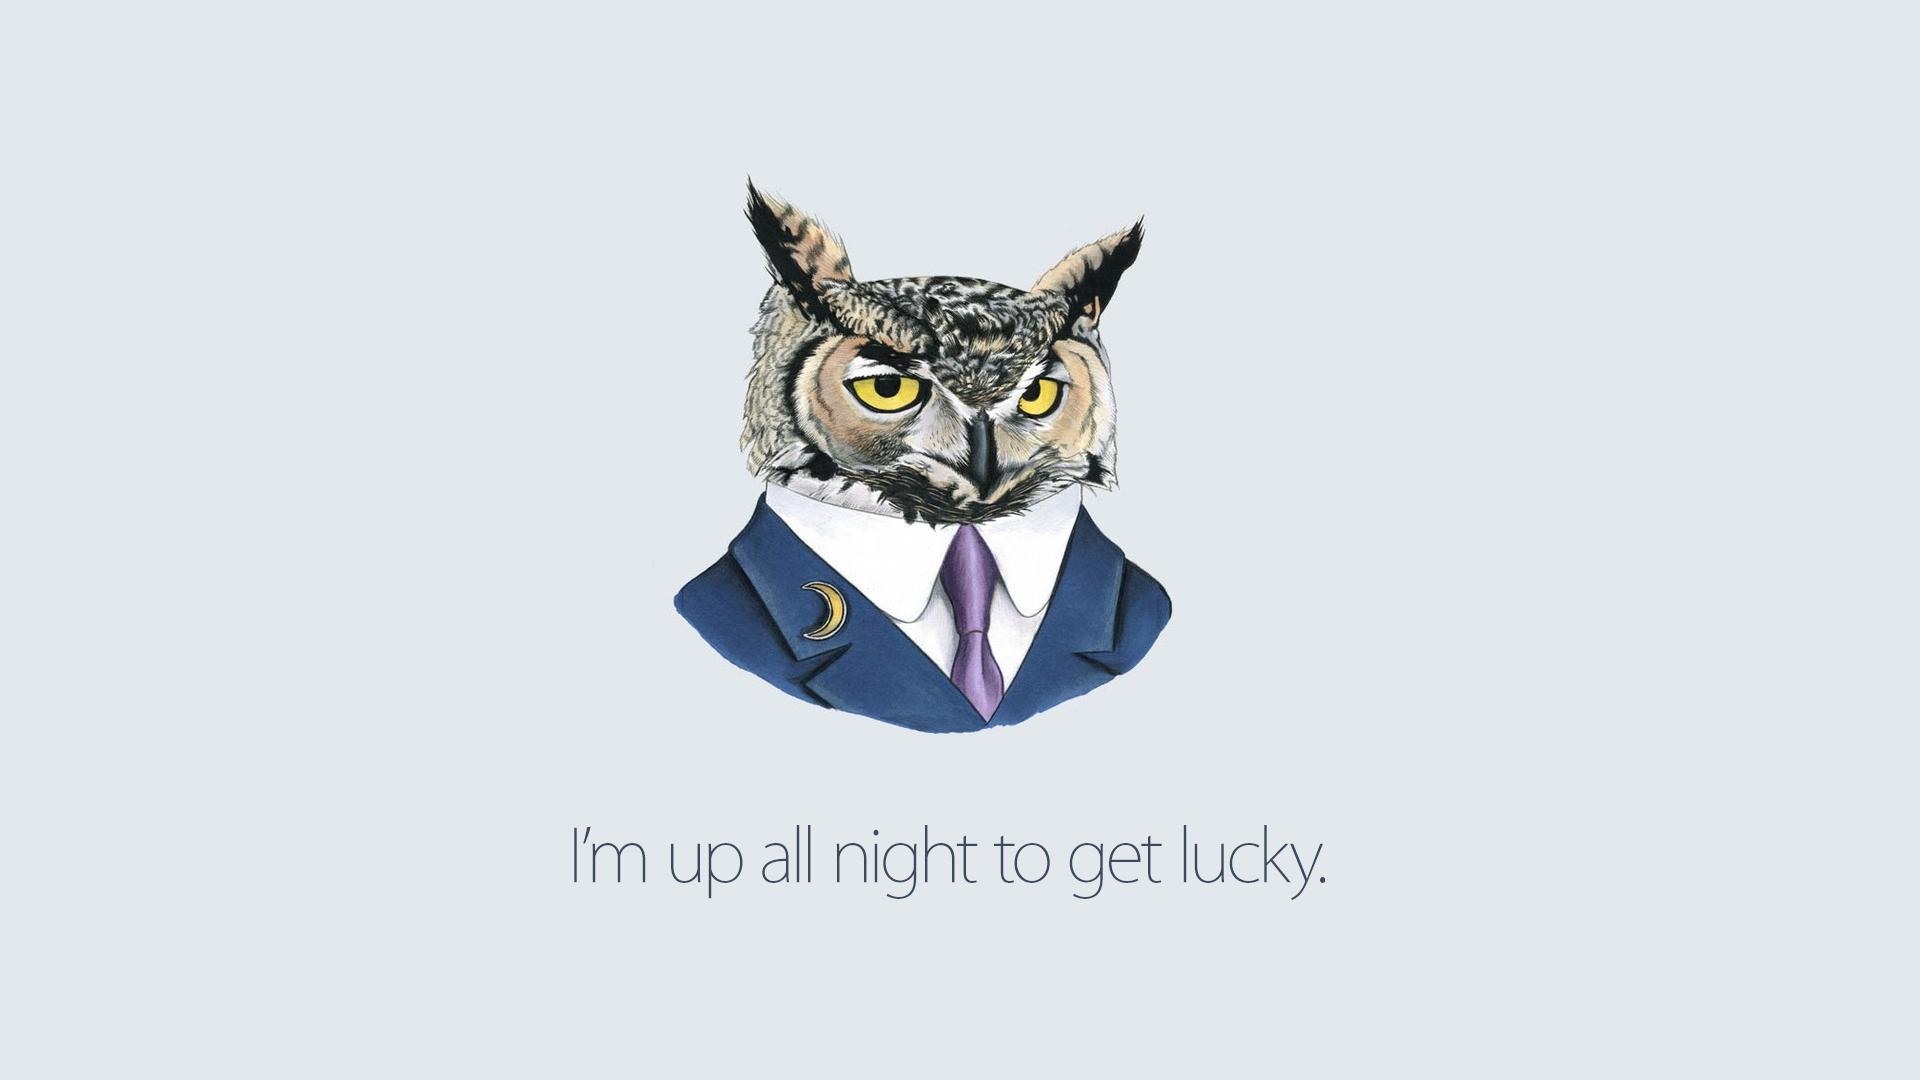 Humor Lucky 1920x1080